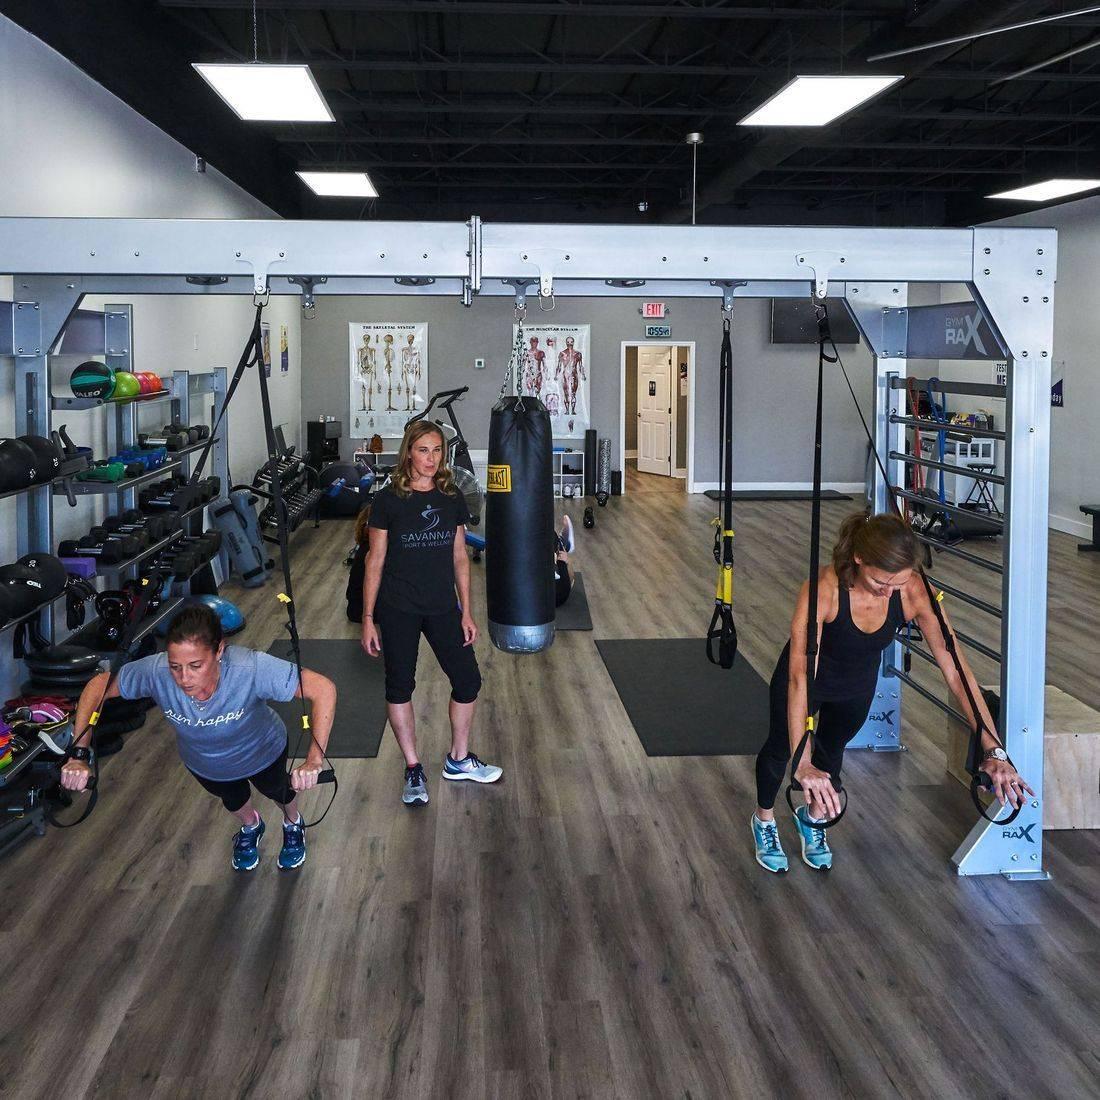 personal training, group training, fuctional fitness, sports training, personal training savannah ga, personal training near me, group fitness savannah ga